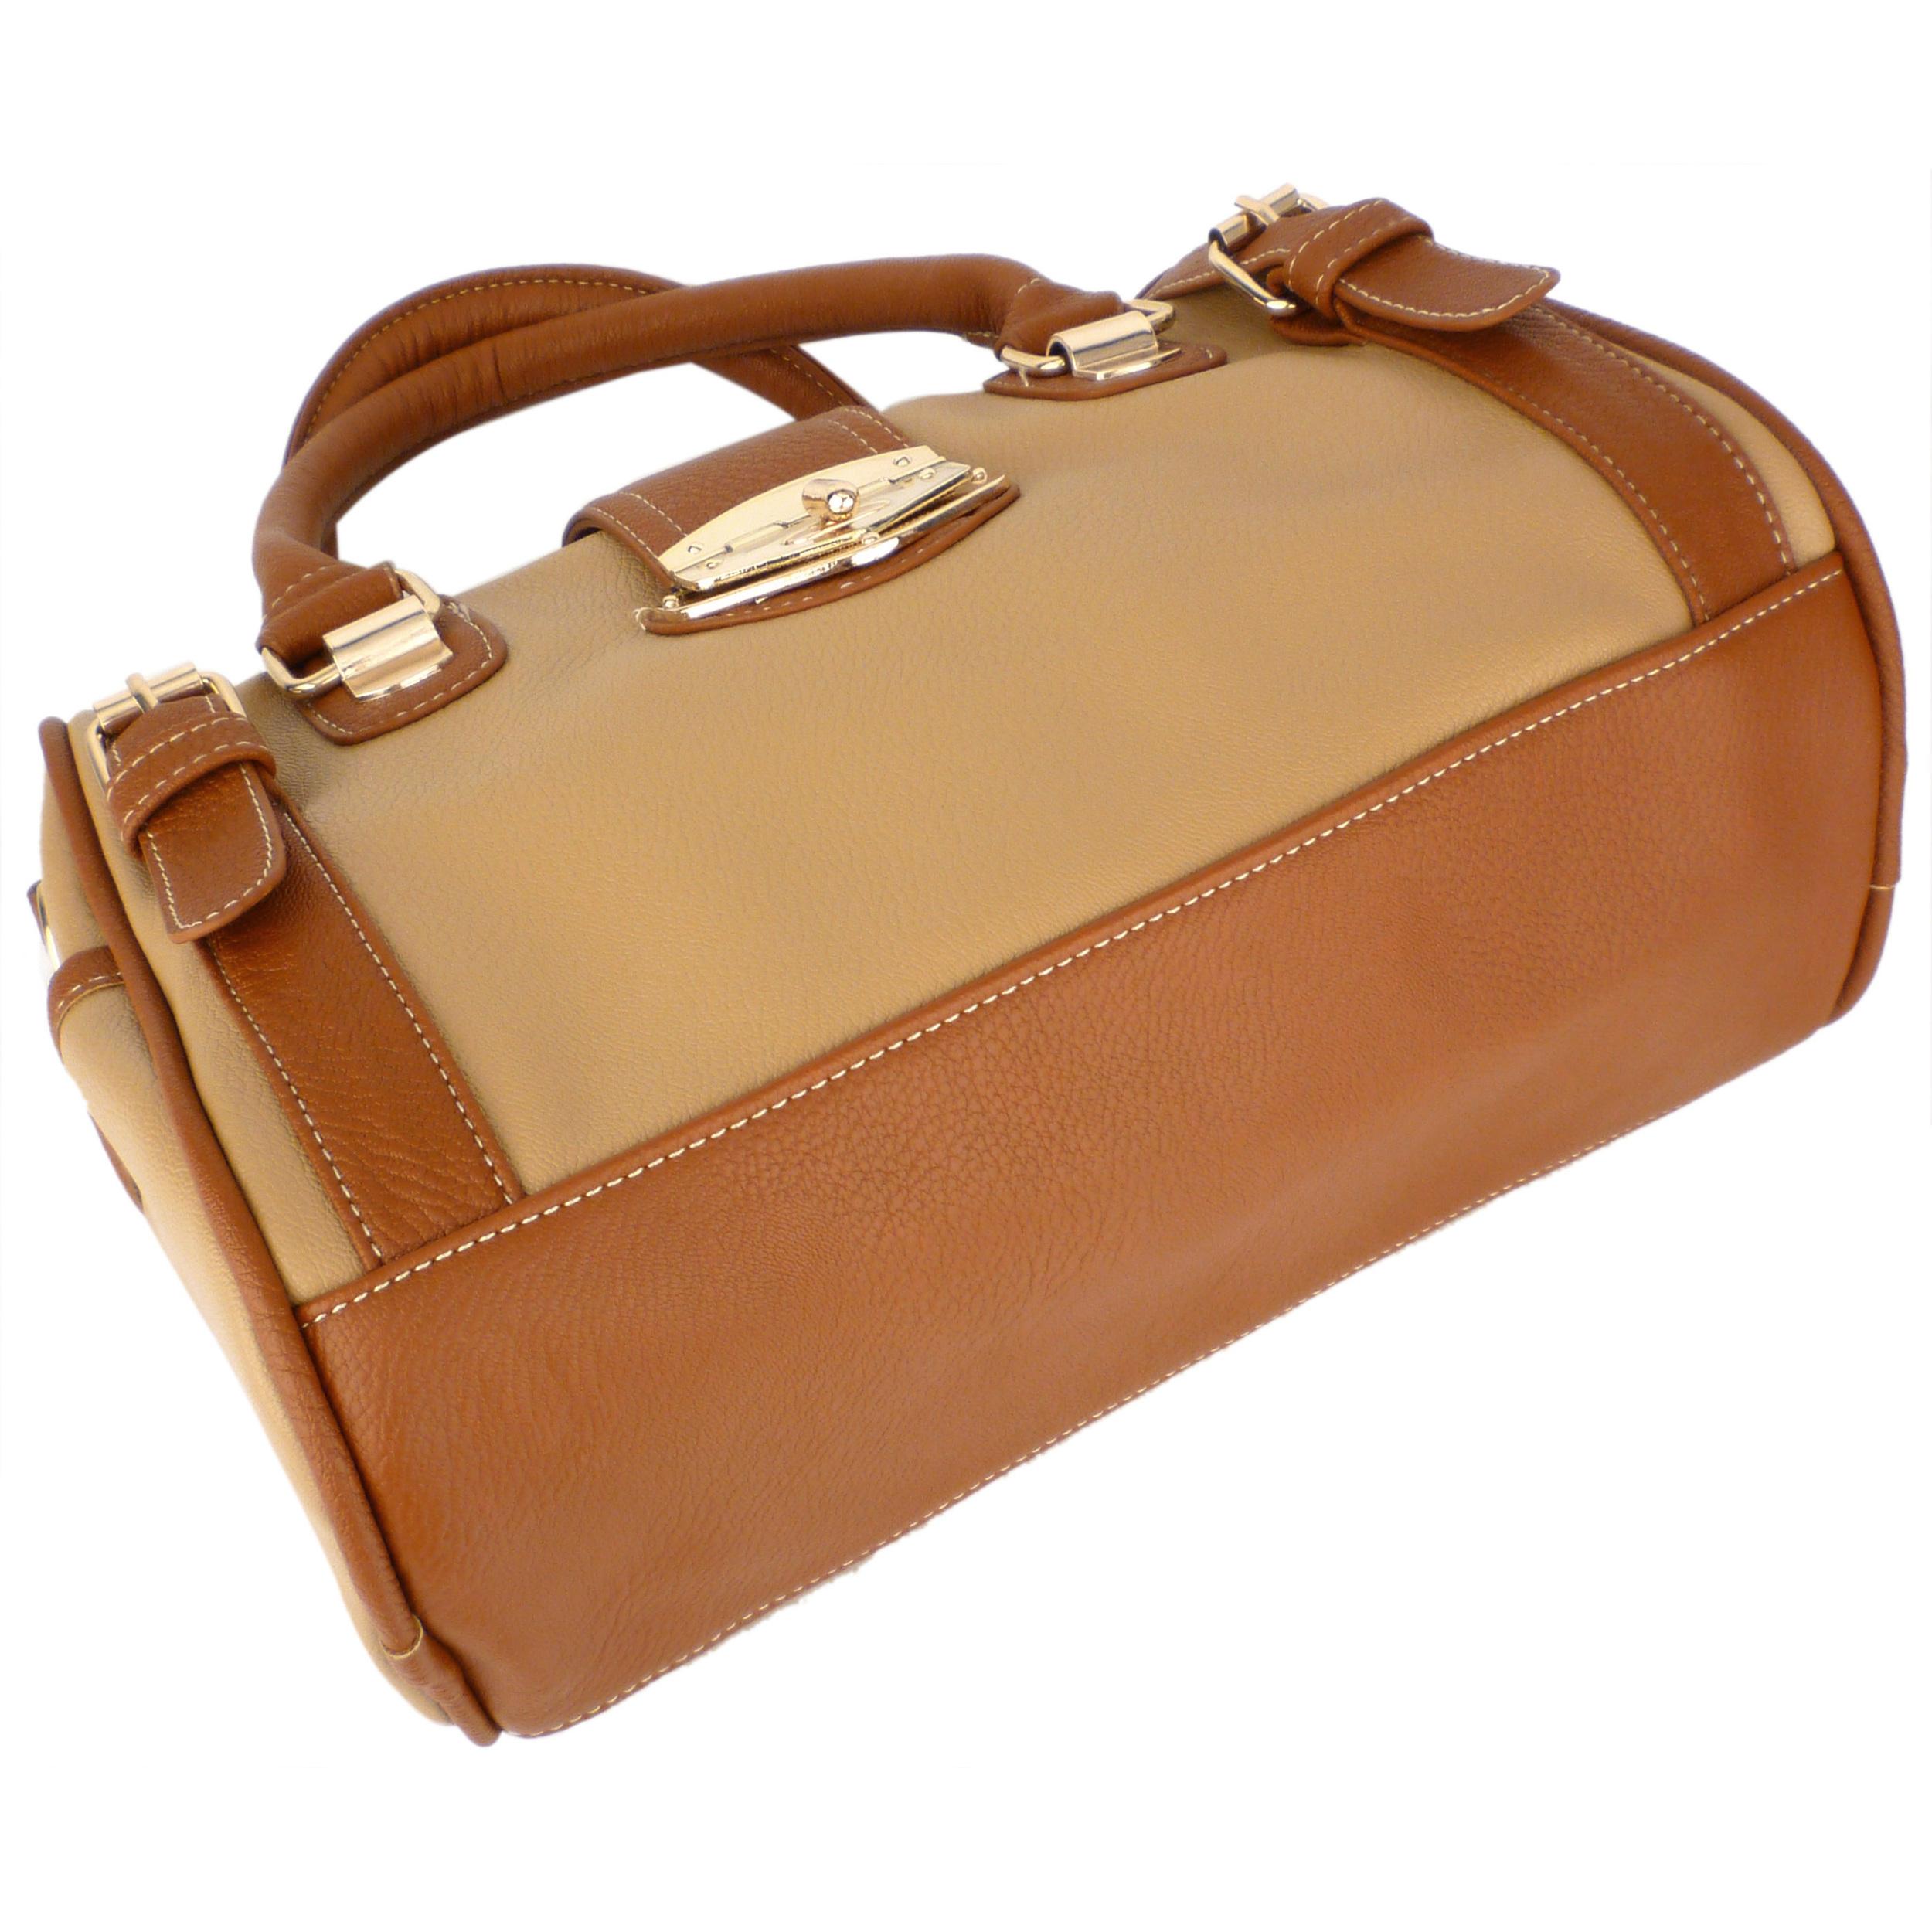 BRADLEY Brown Dual-tone Bowler Style Handbag Bottom